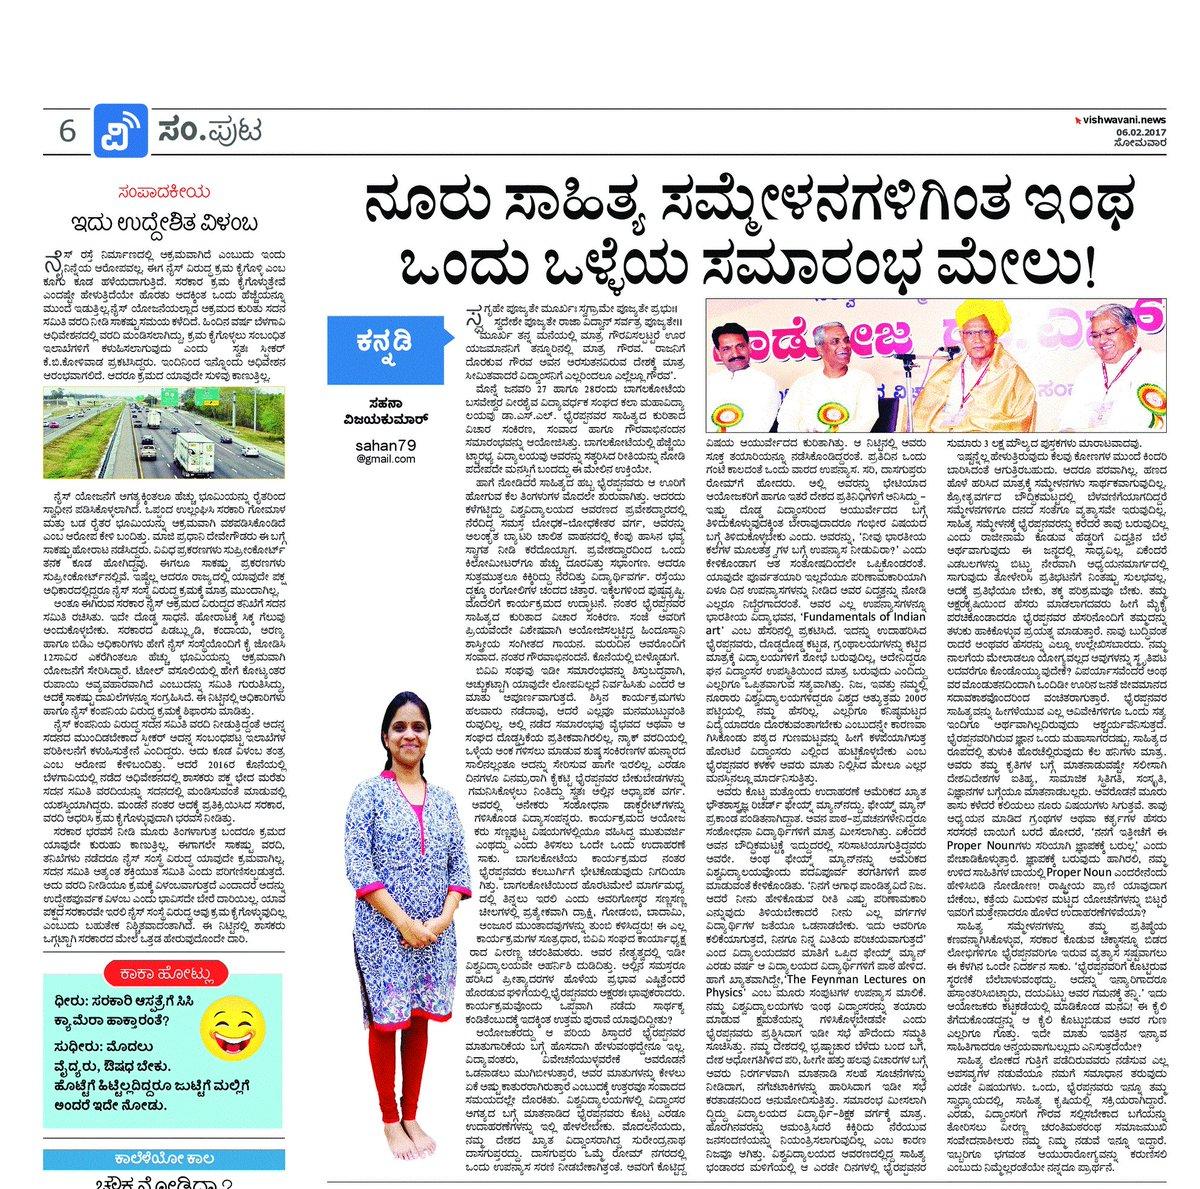 Today\'s column in @VishwavaniNews on Bagalkot\'s program @ @BhyrappaFanPage